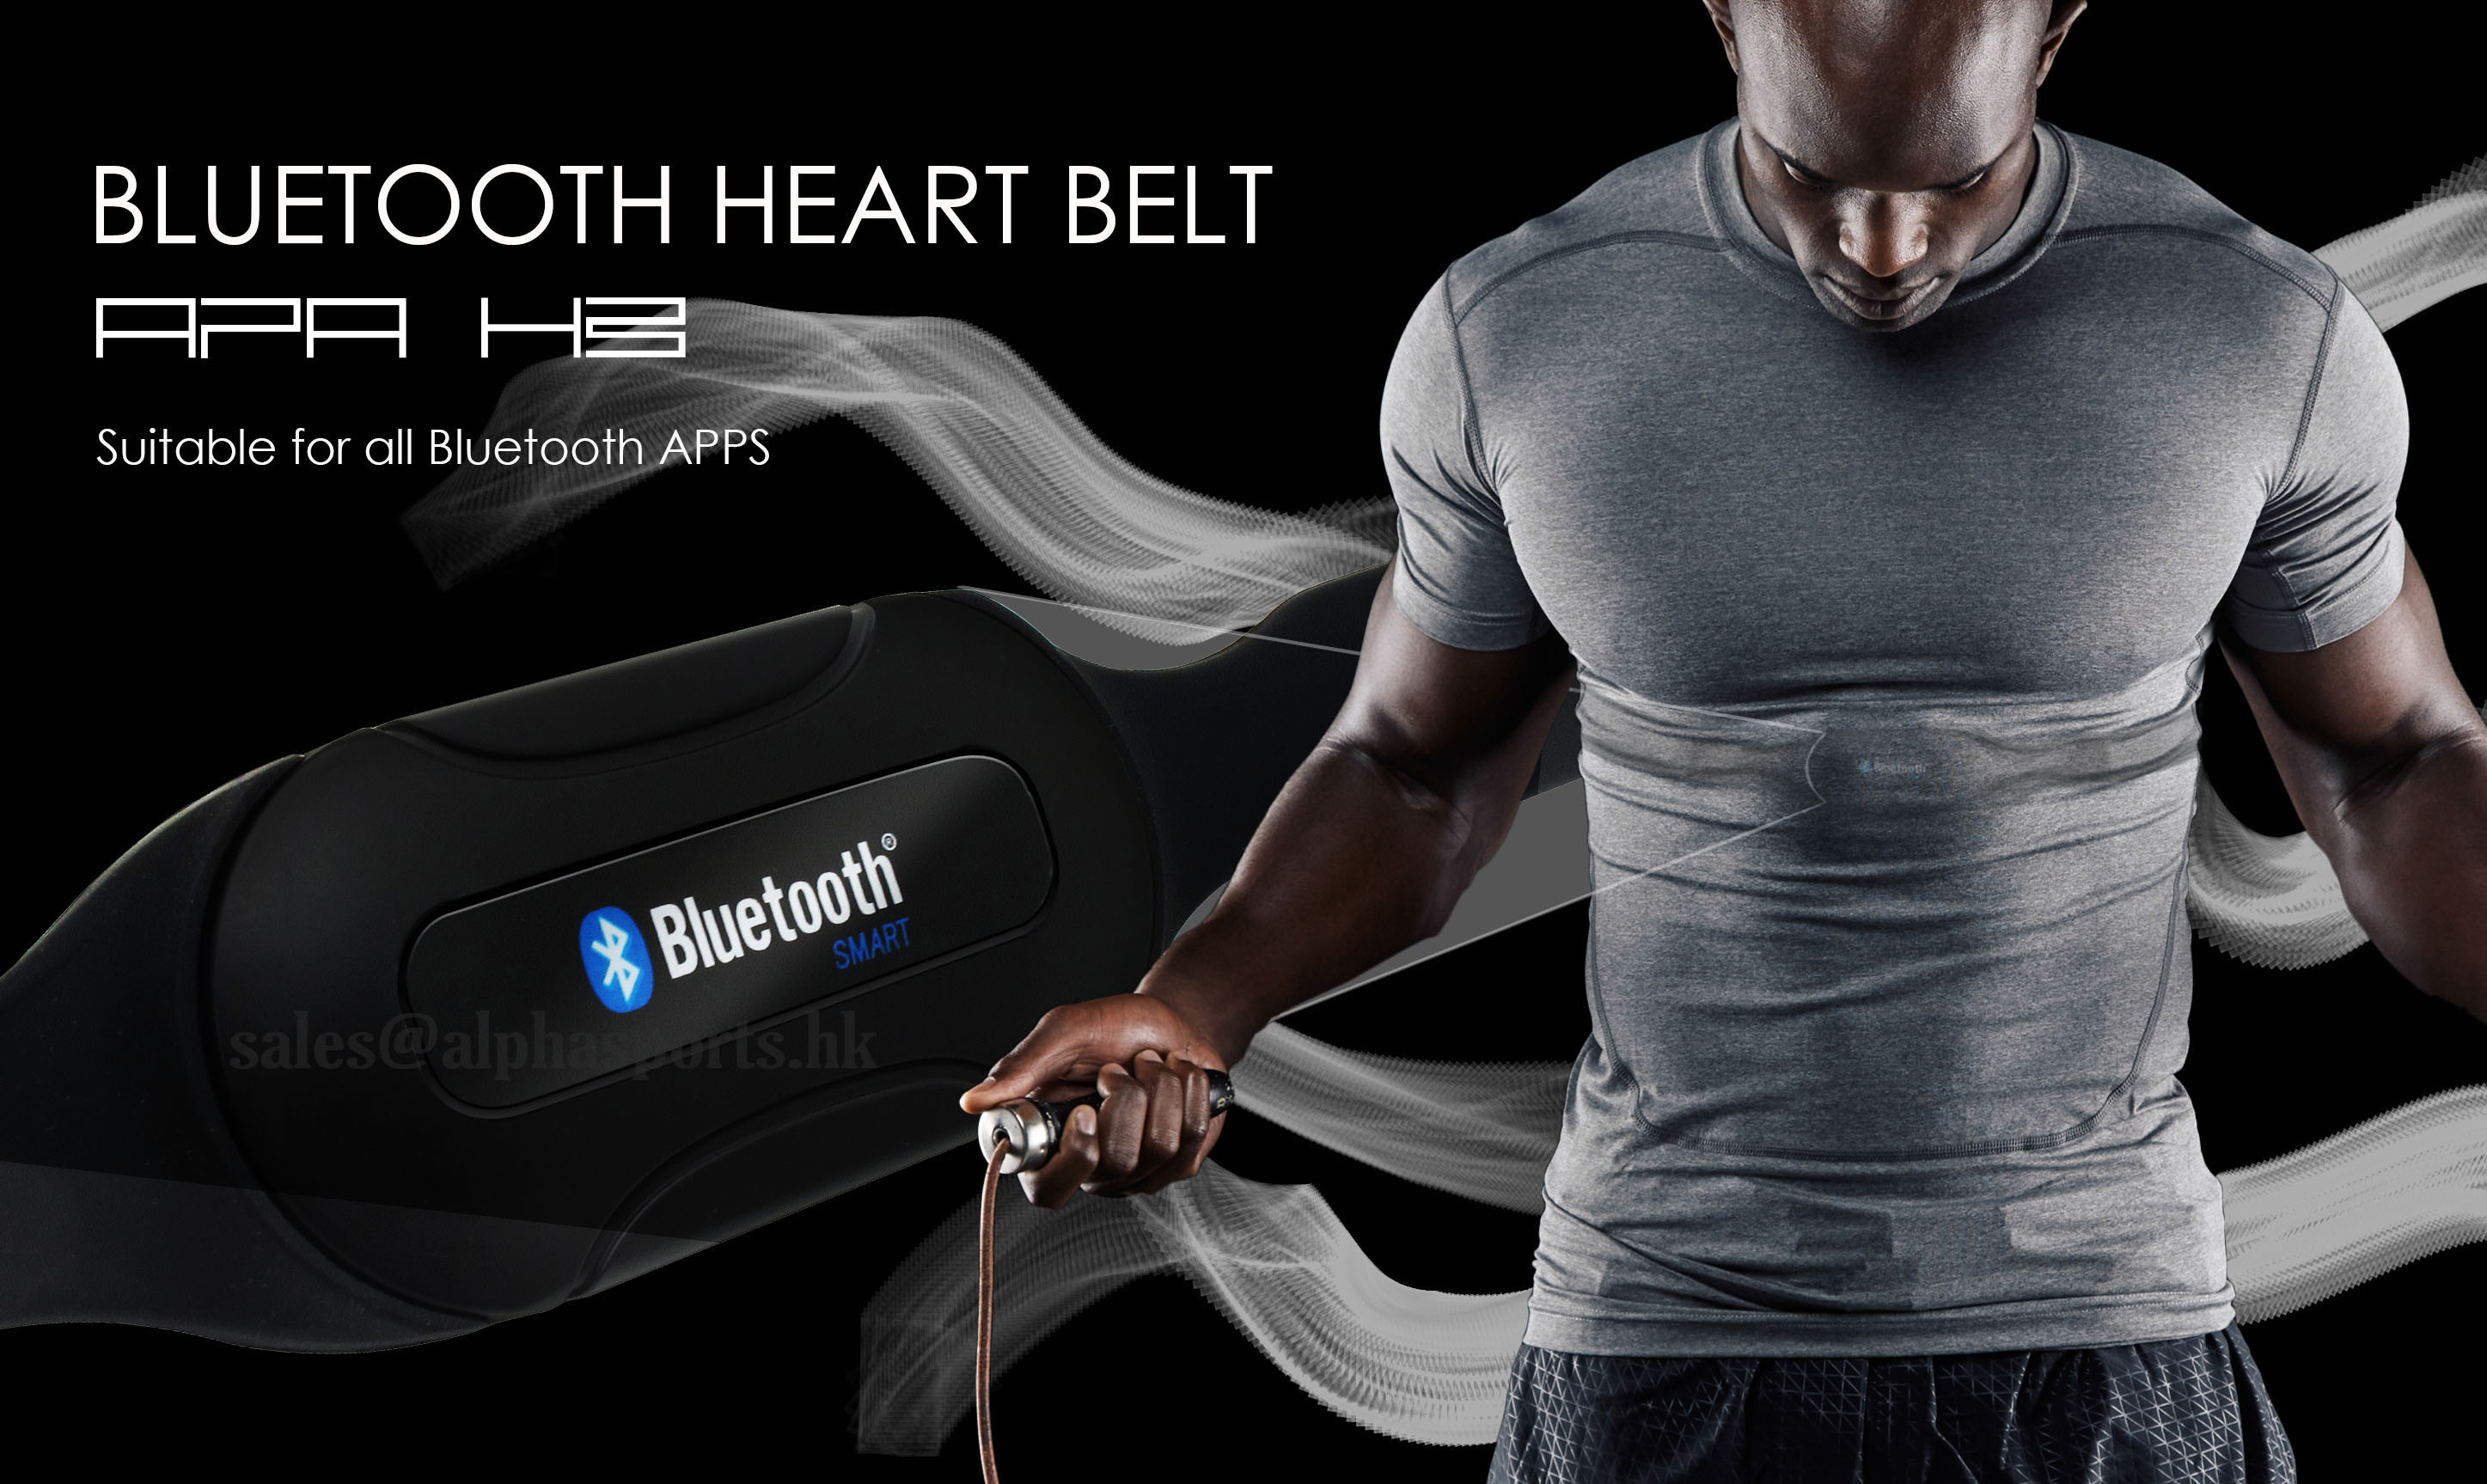 APA BLUETOOTH HEART RATE BELT